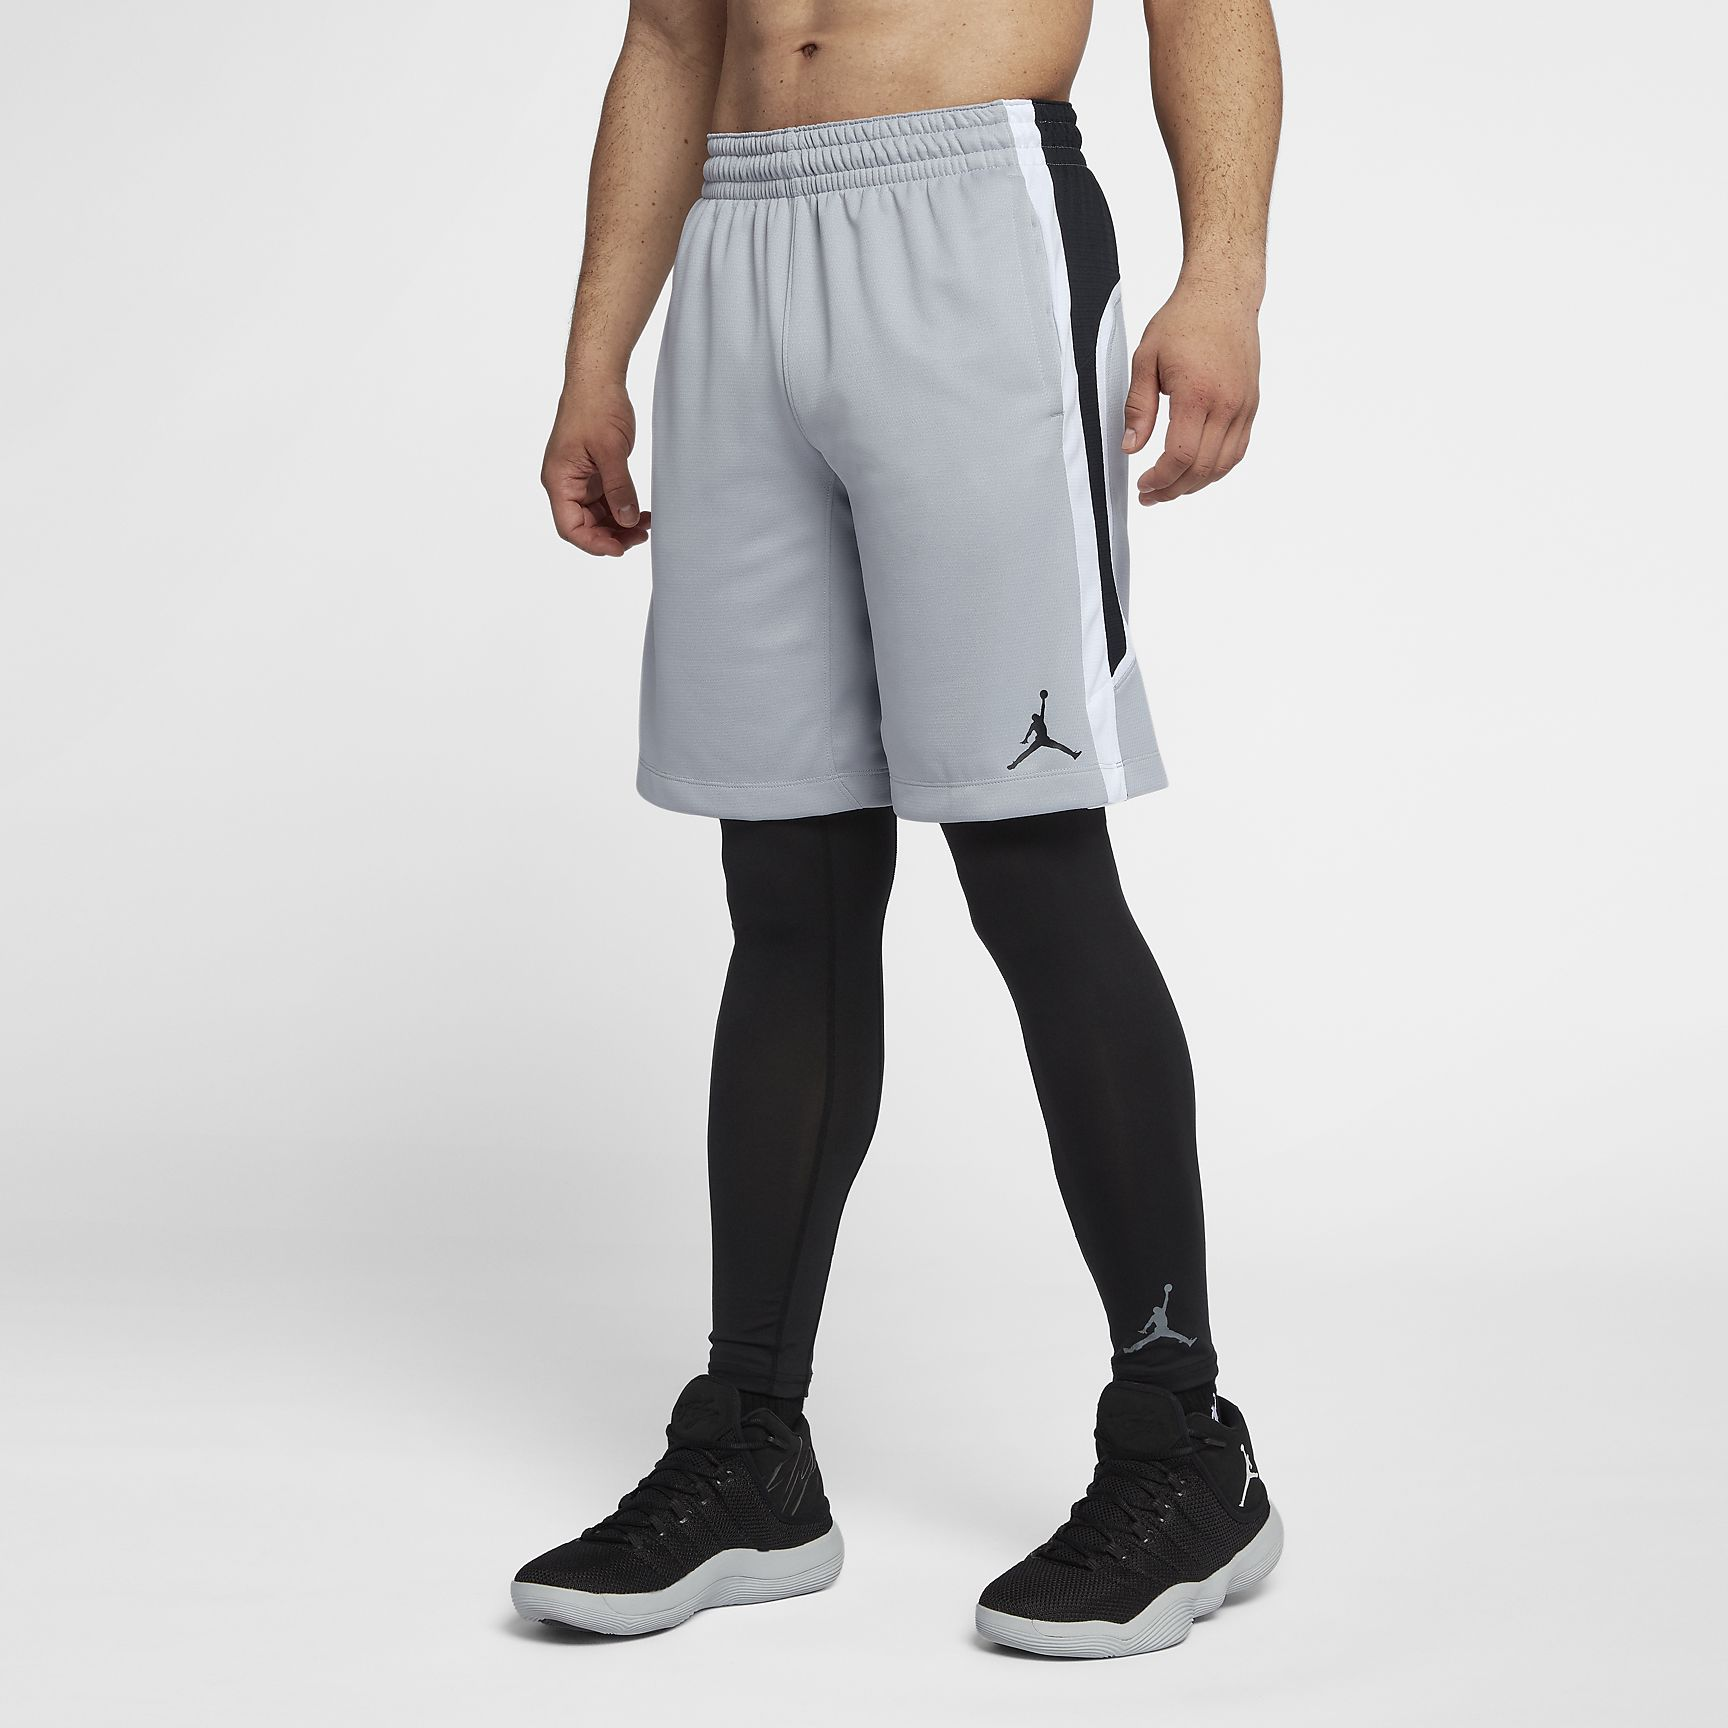 cbdd83fdcbf Jordan Flight Basketball Shorts - Clothes Shorts - Sporting goods ...